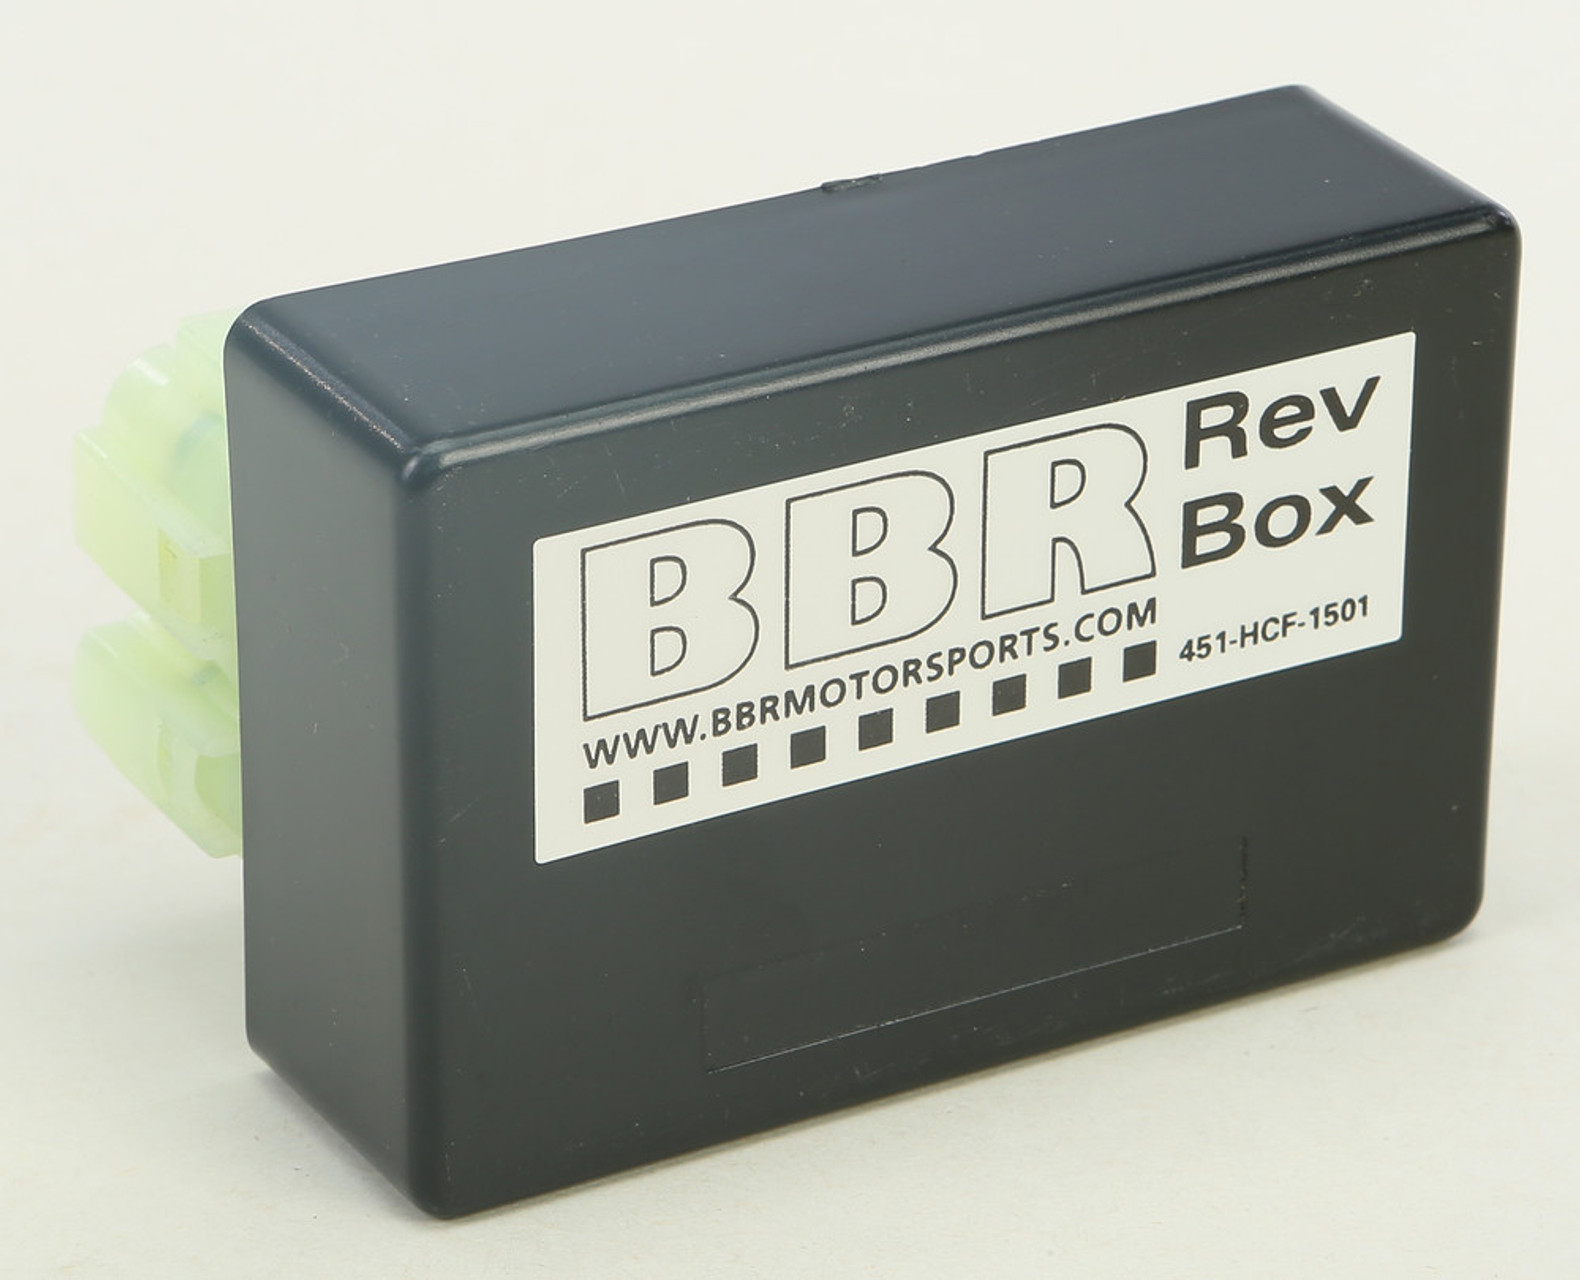 BBR REV BOX 451-HCF-1501